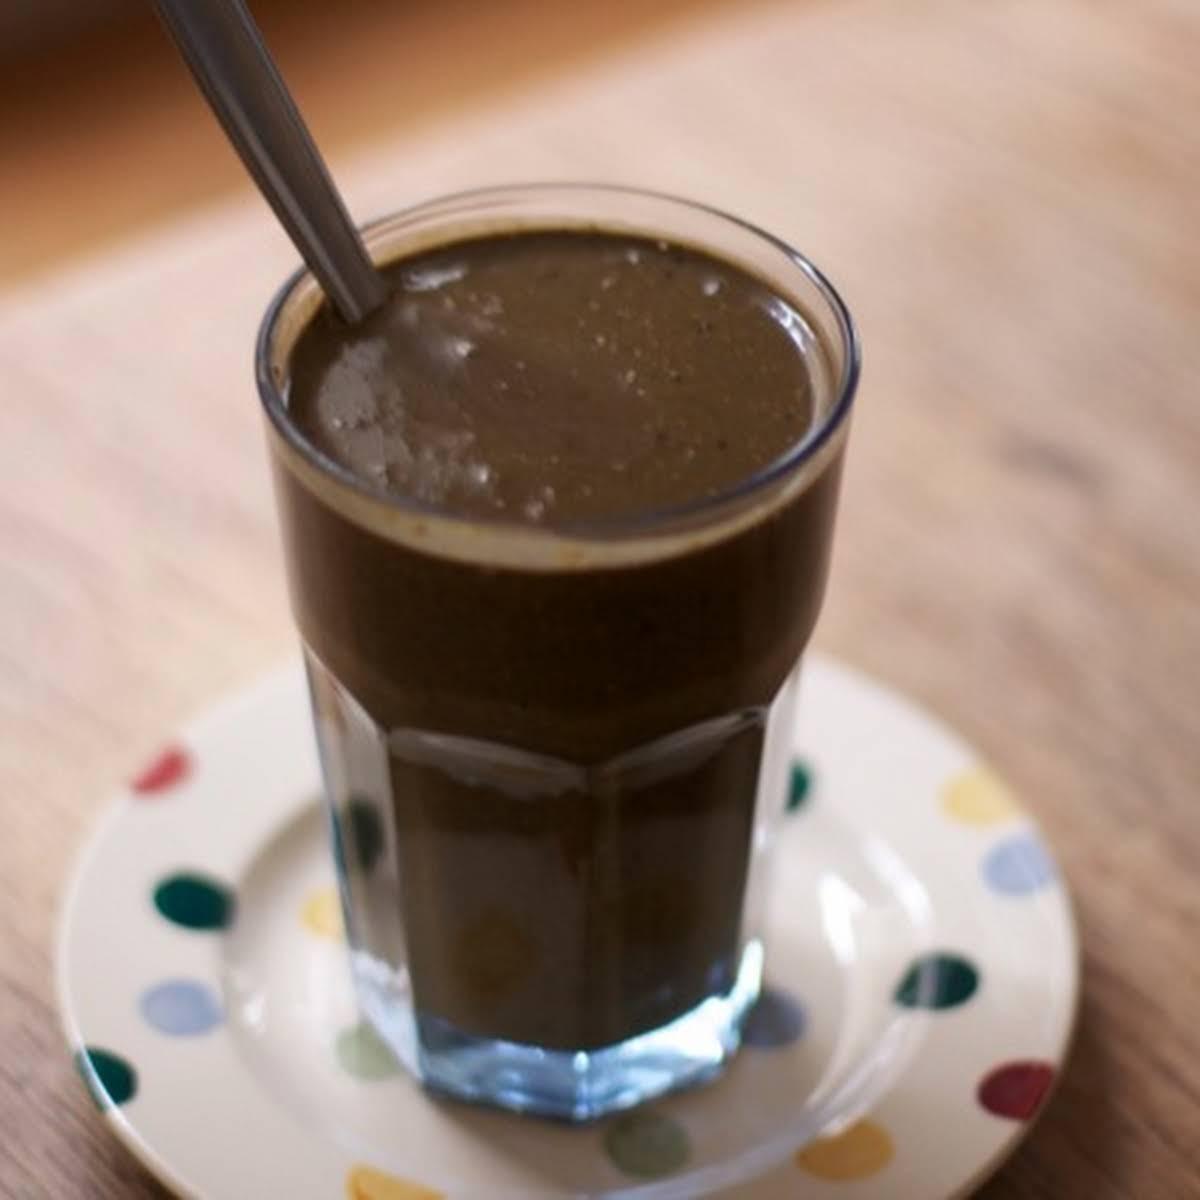 Chocolate detox drink Shrink Mummy Shake